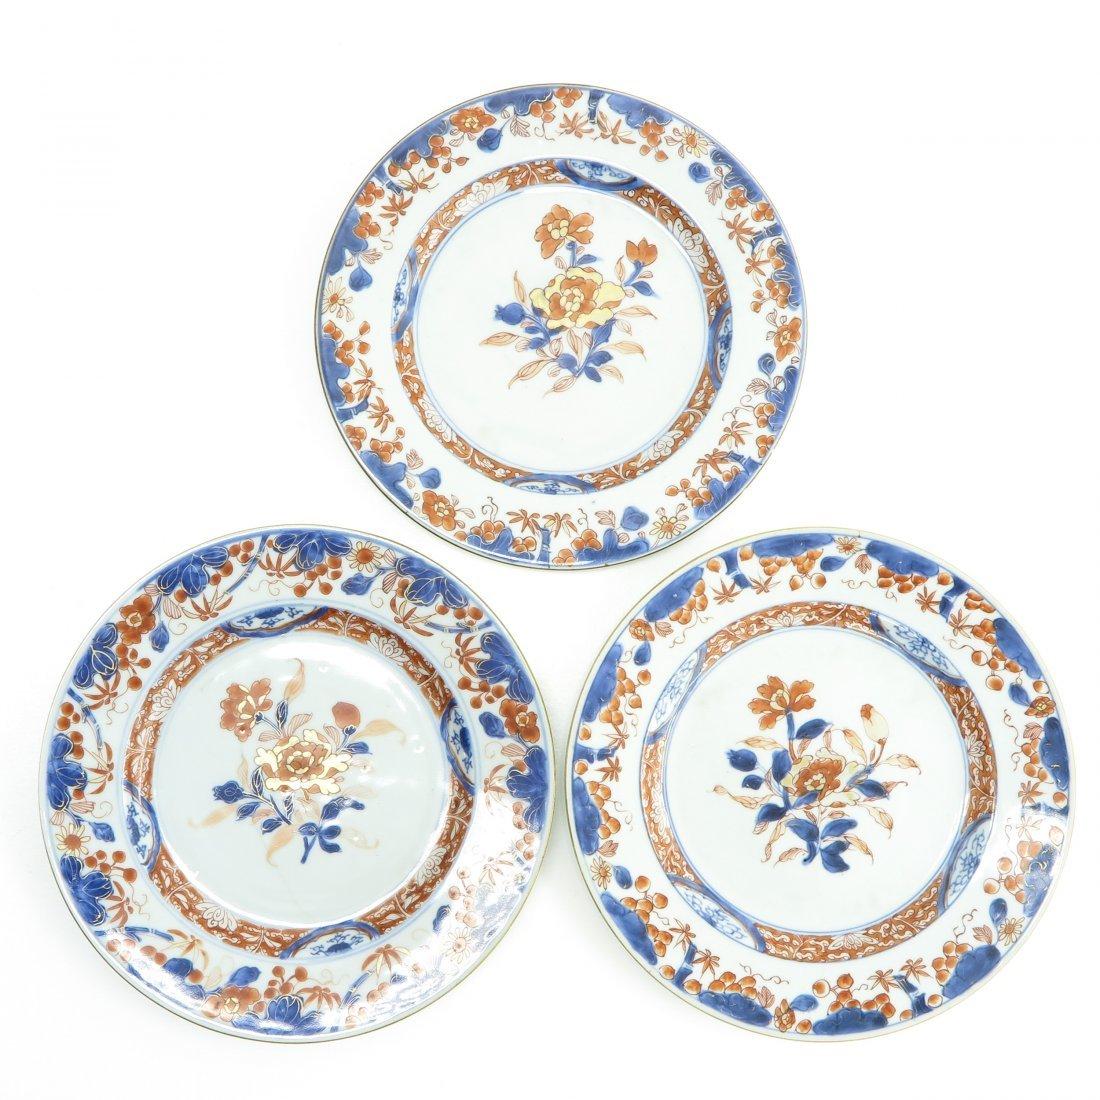 18th Century China Porcelain Imari Decor Plates